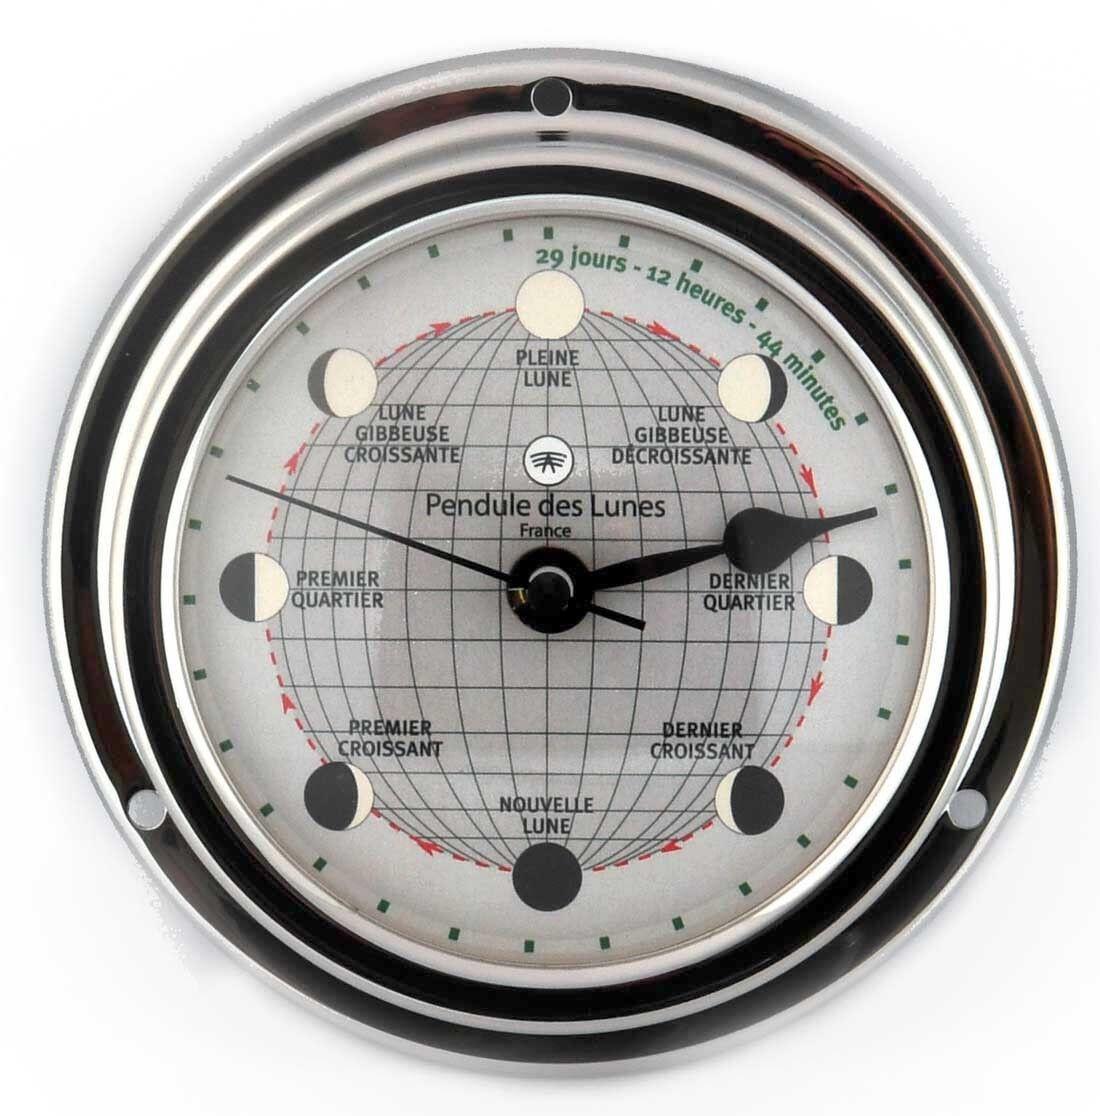 Sport Haushaltsgeräte Altitude 858th Thermometer Hygrometer Messing Maritim 127mm